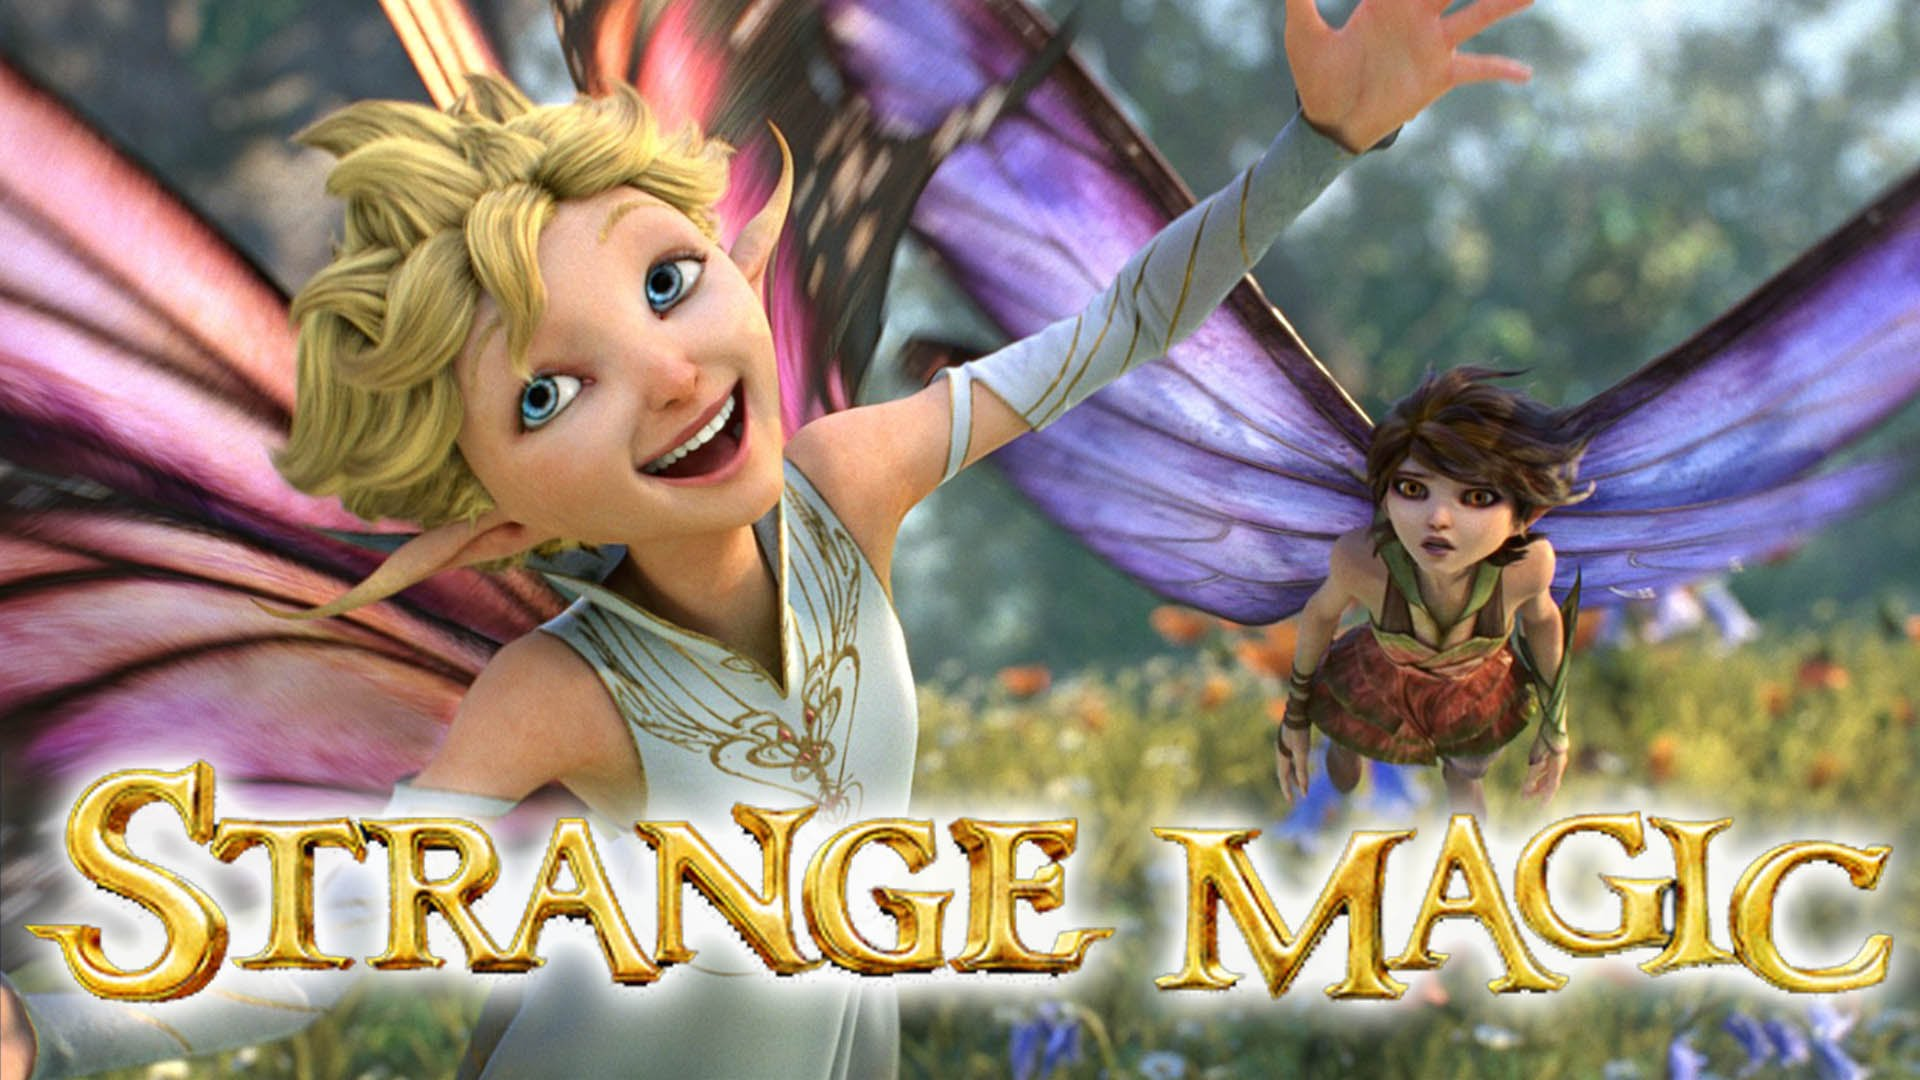 Strange Magic HD Wallpaper Background Image 1920x1080 ID 1920x1080